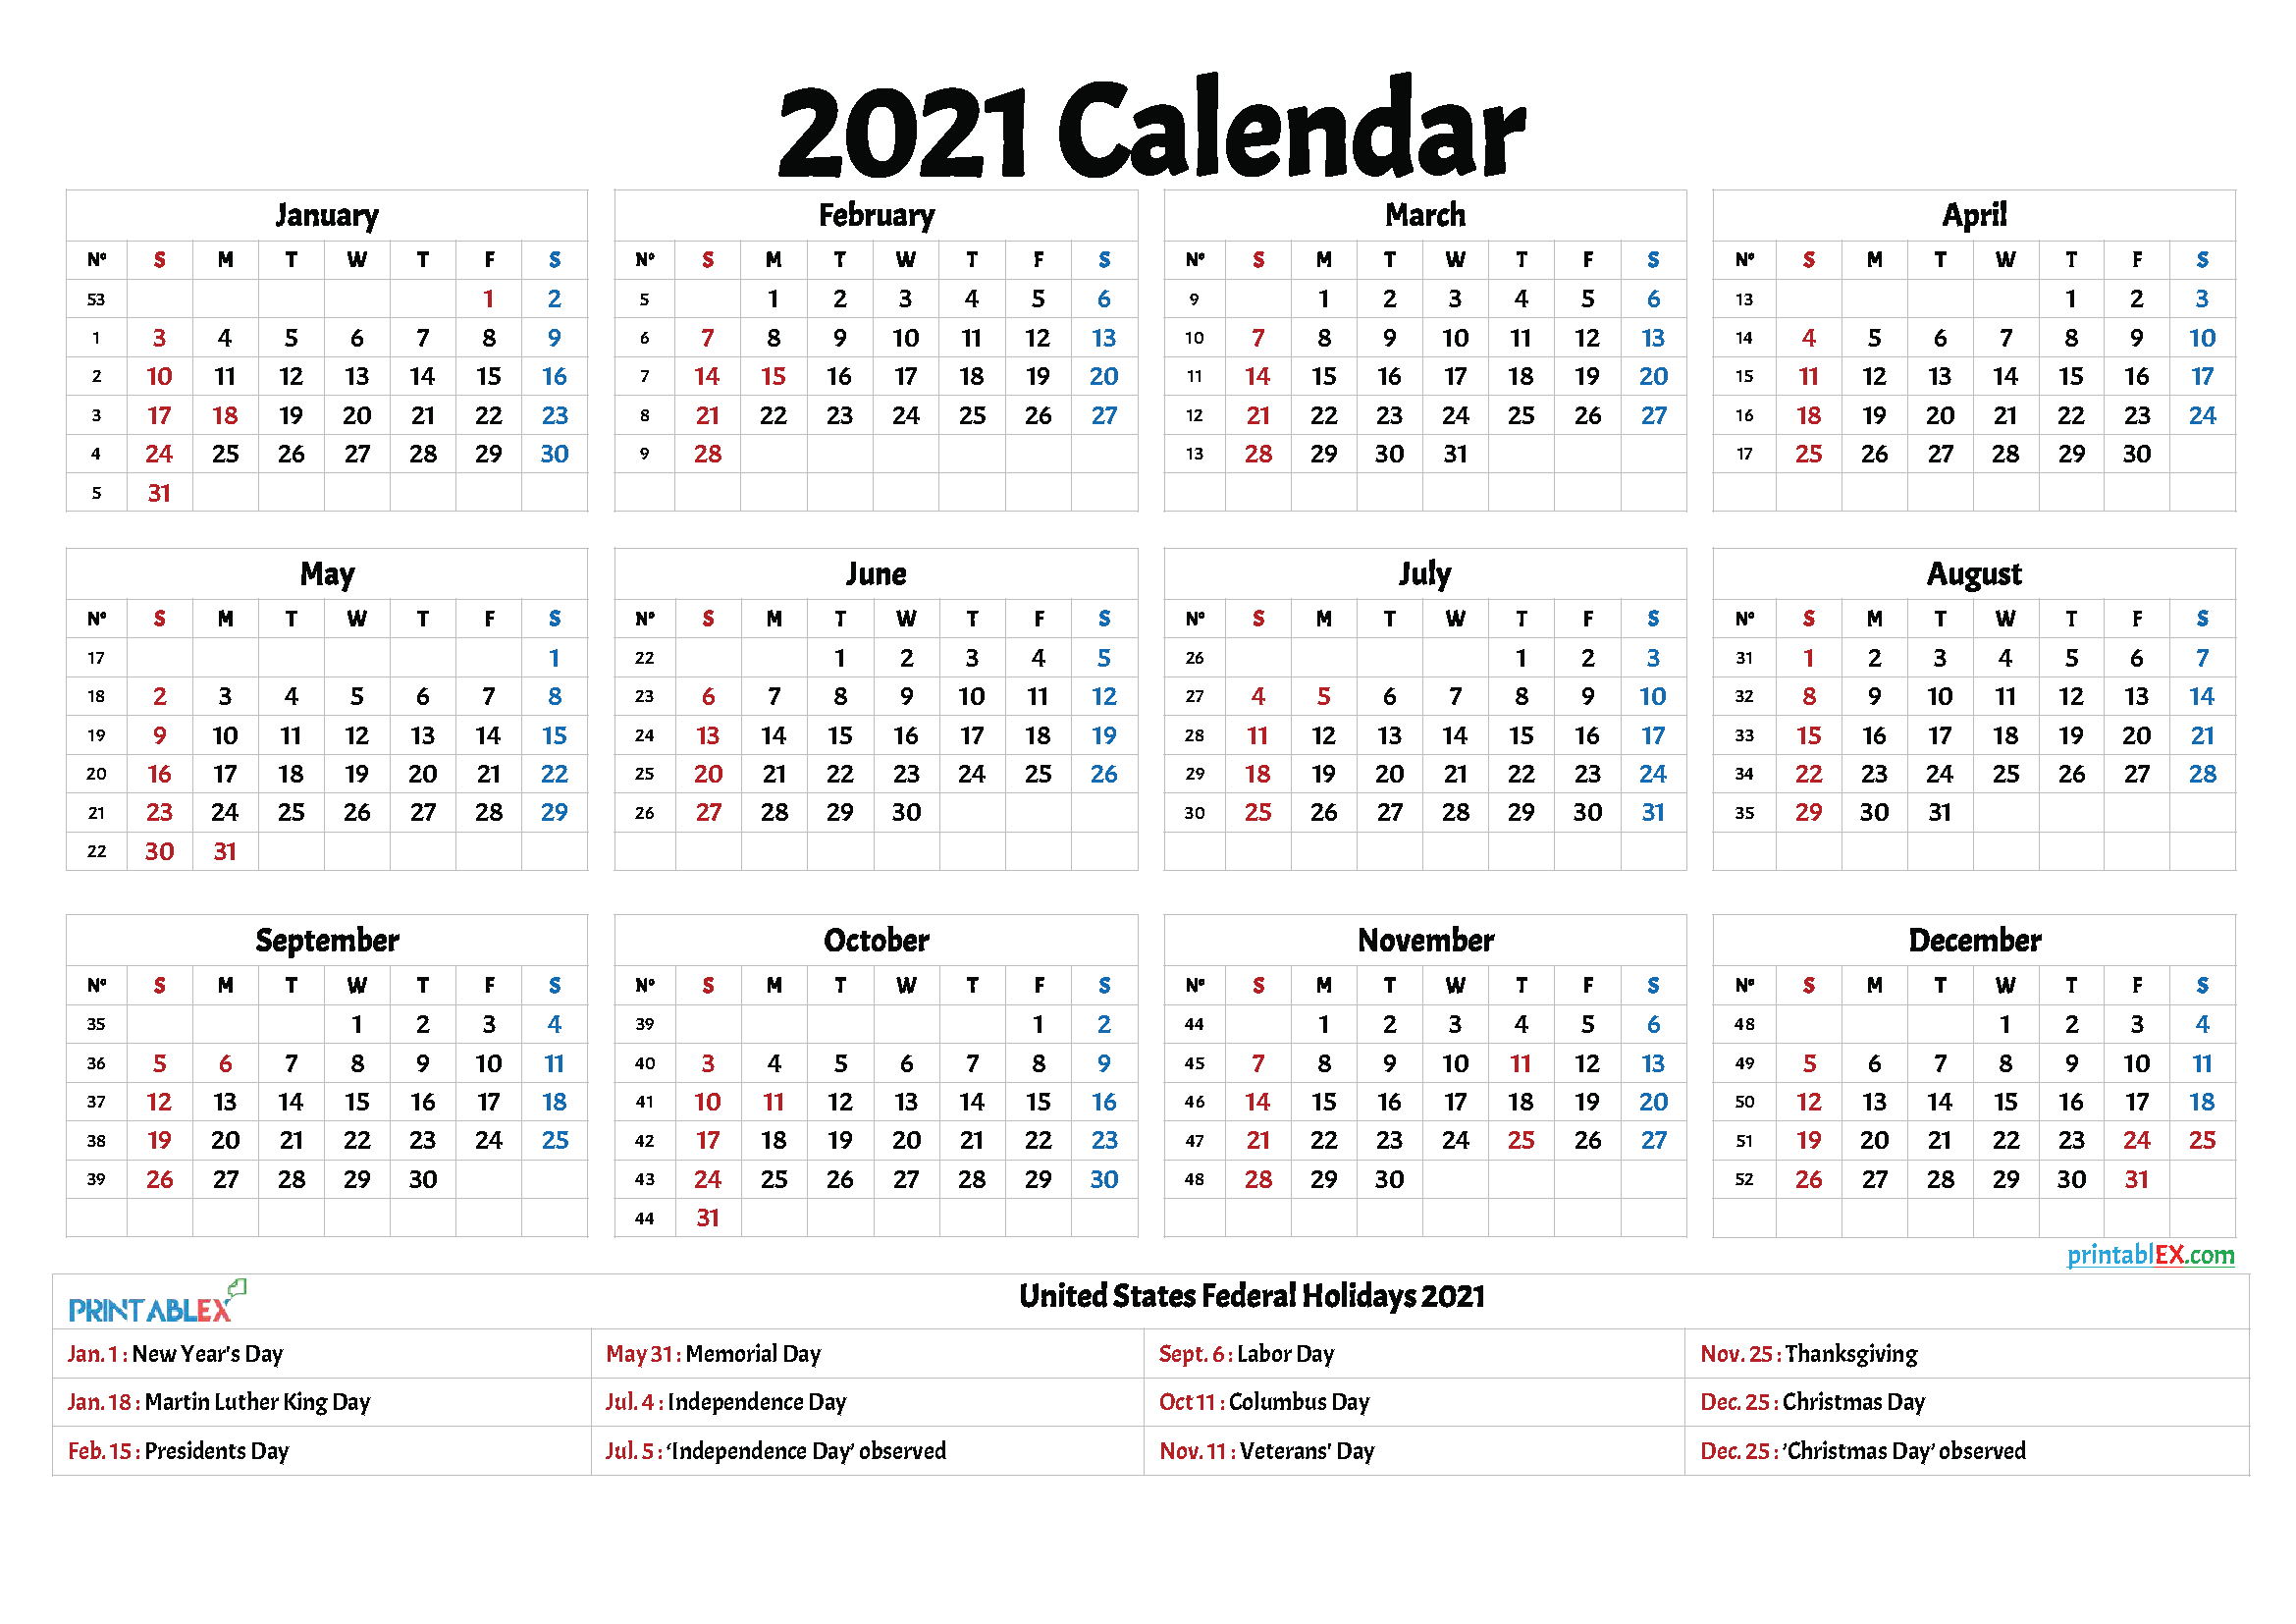 Free 2021 Printable Calendar With Holidays throughout Federal Government Calendar 2021 Printable